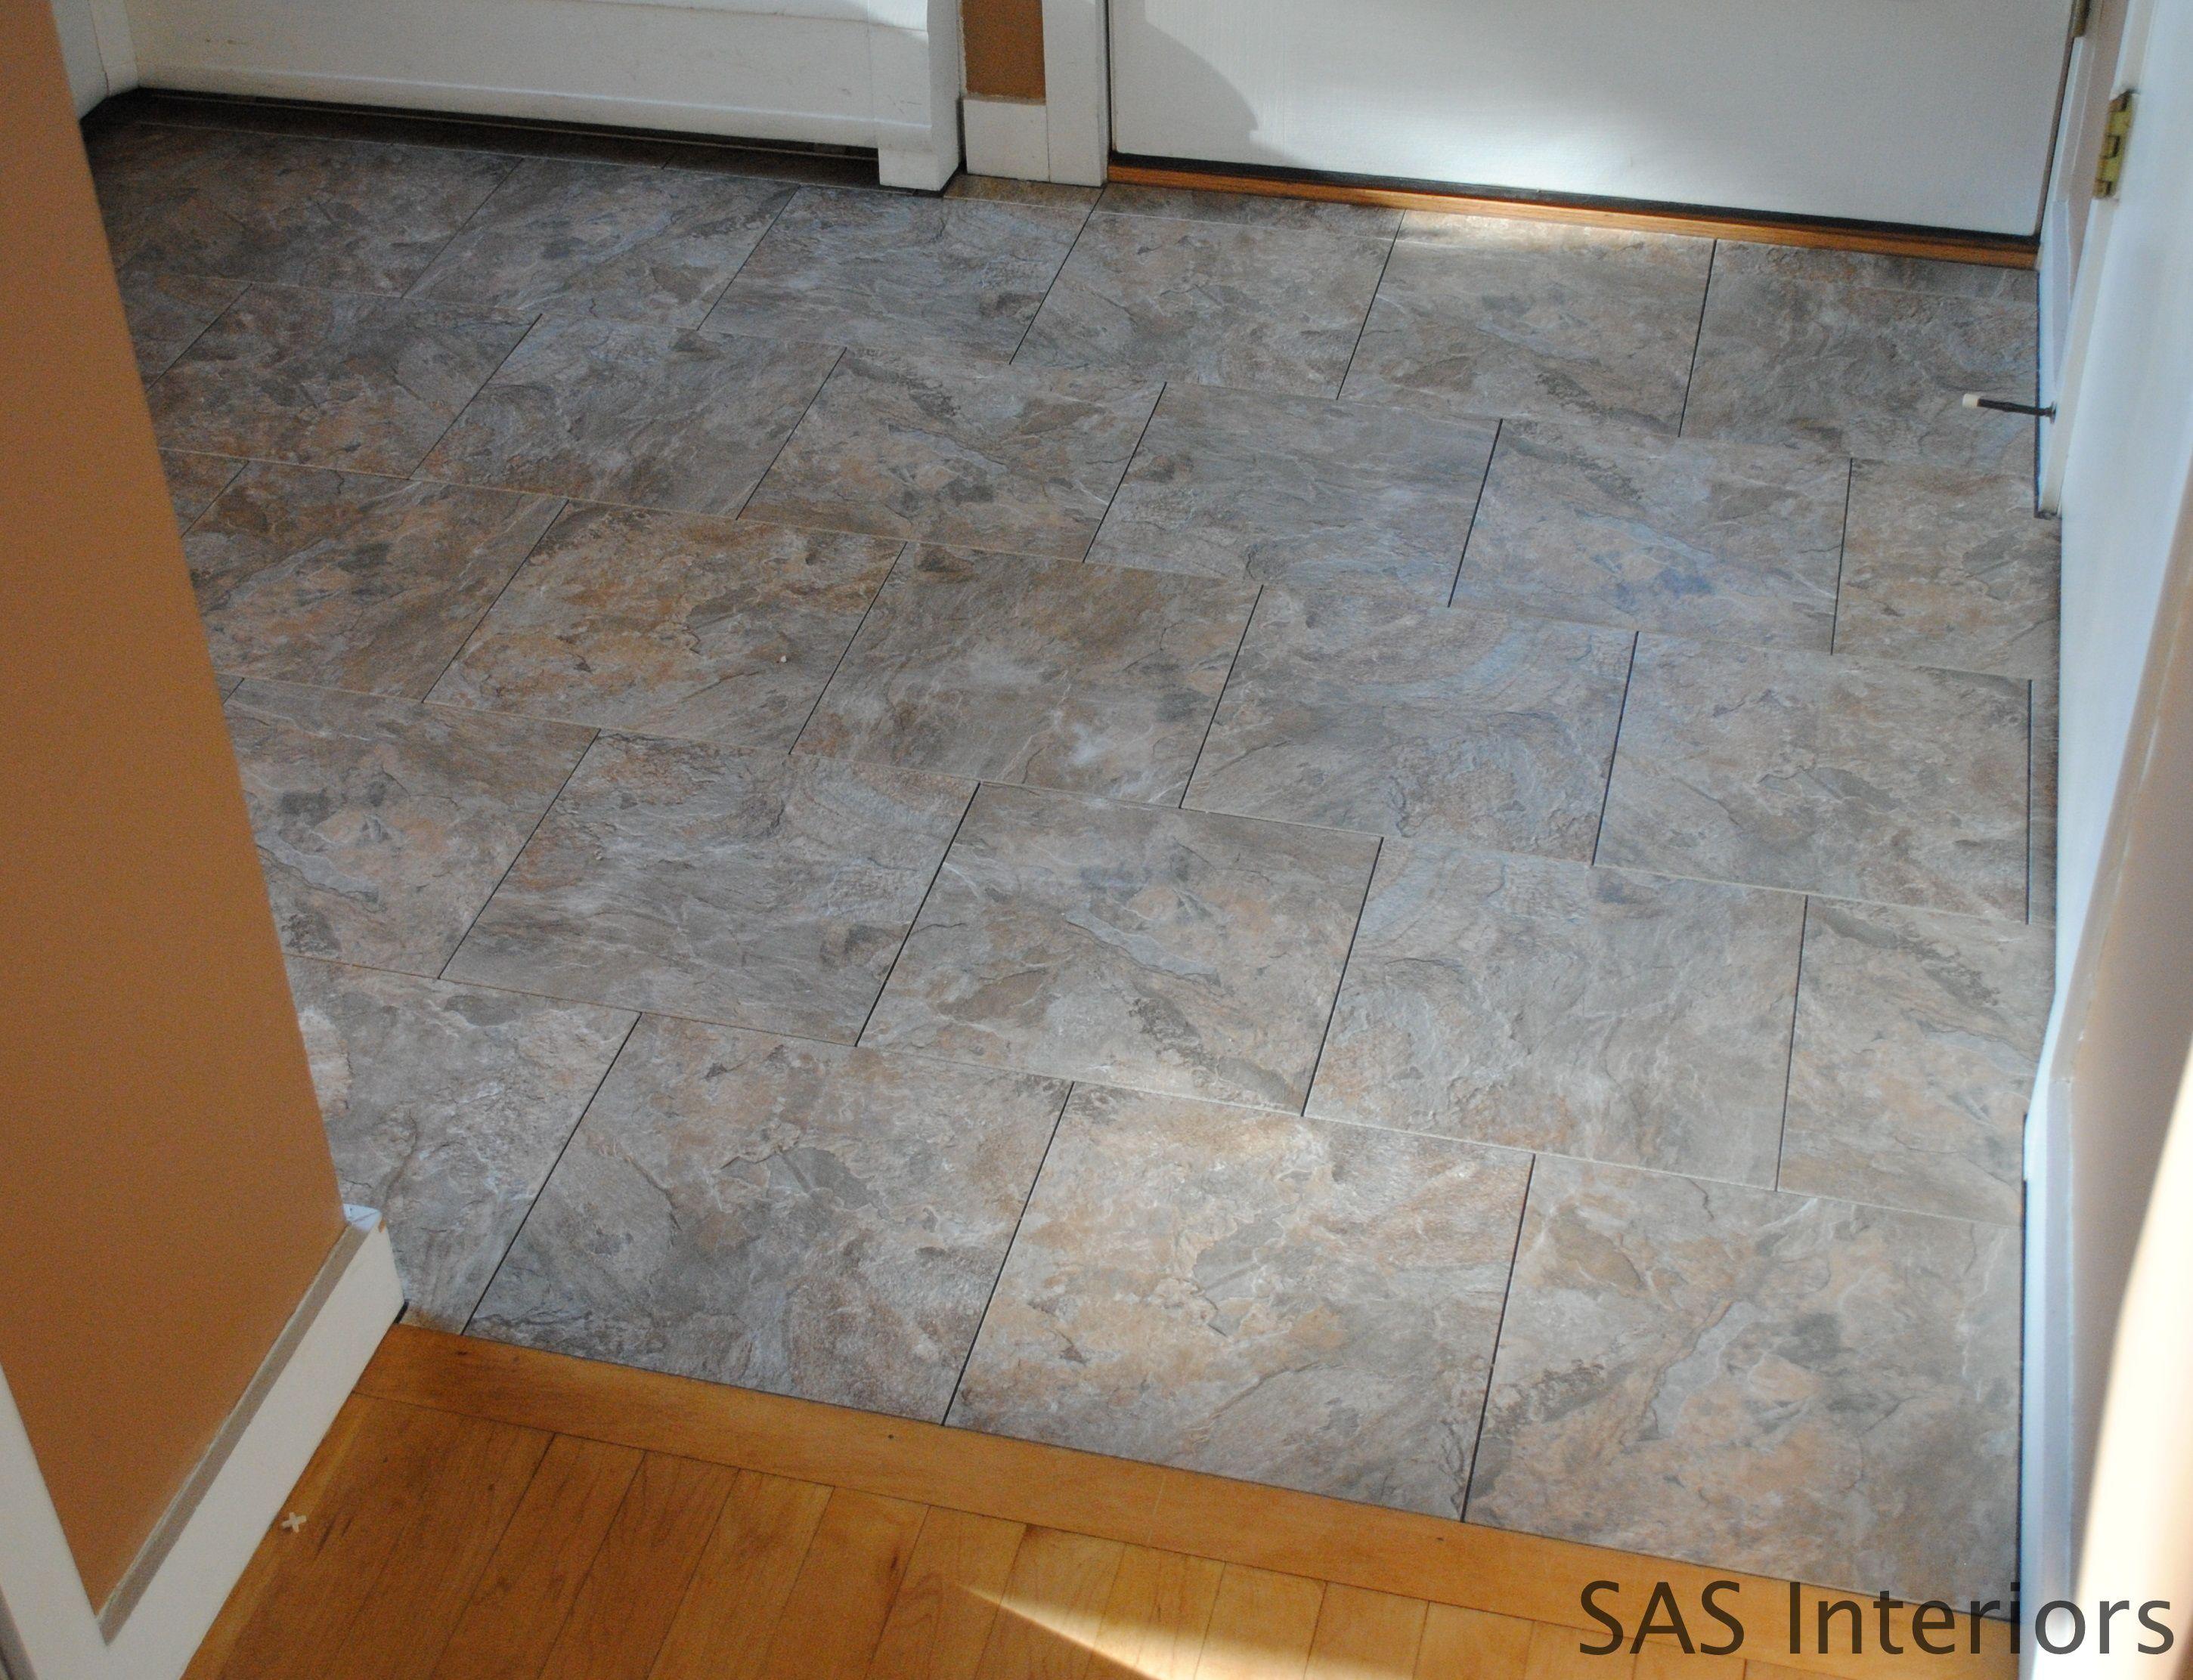 DIY: How to Install Groutable Vinyl Floor Tile | DIY | Pinterest ...